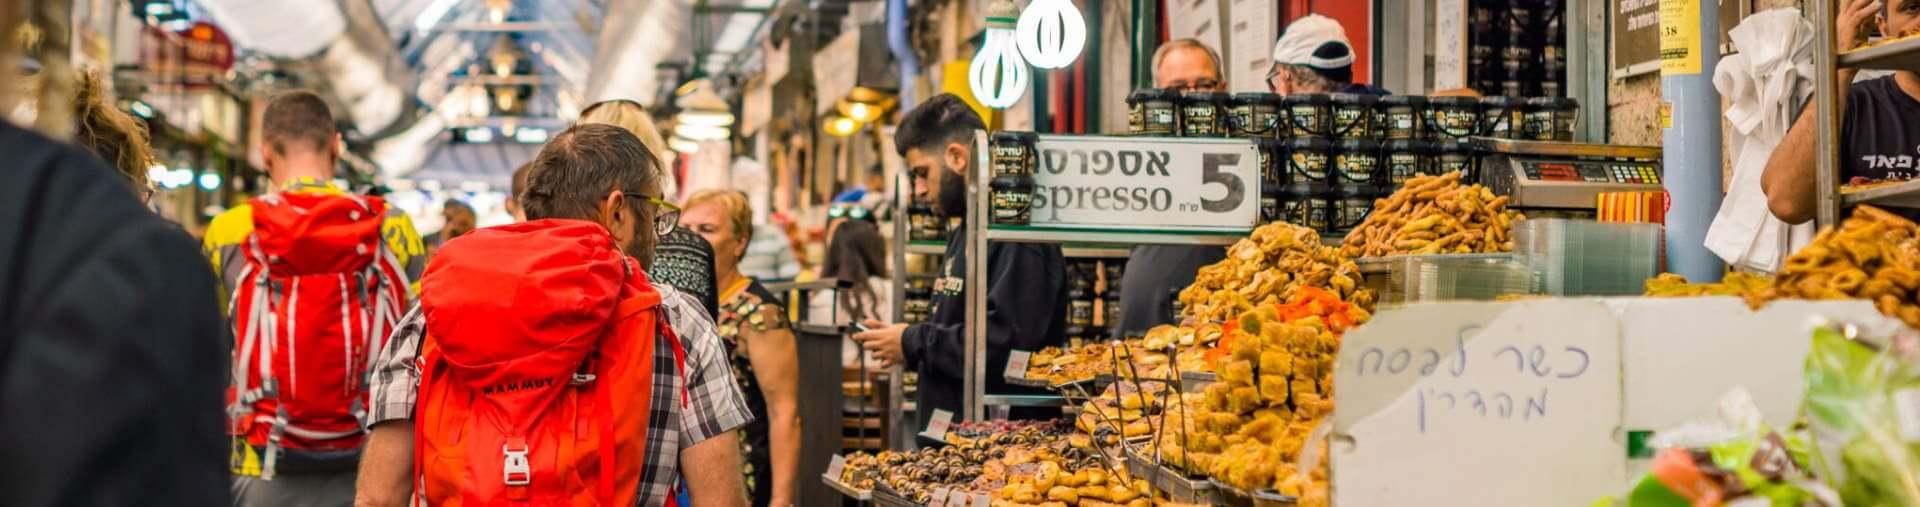 Mahane Yehuda Market Tour